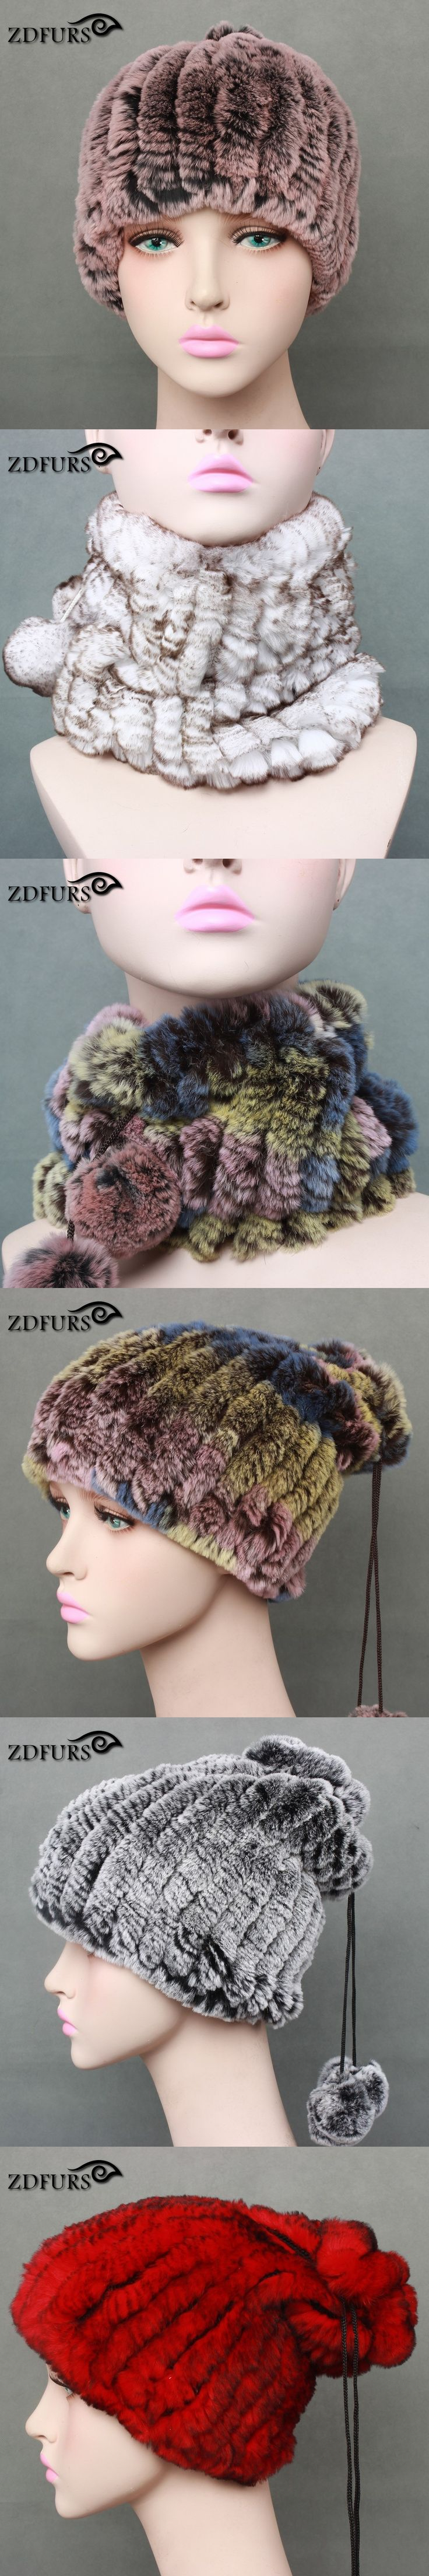 Glaforny 2017 New Arrival Knitted Rex Rabbit Fur Hats with 2 fur balls Real Rabbit Fur Scarfs Women Winter Fur Beanies Russian